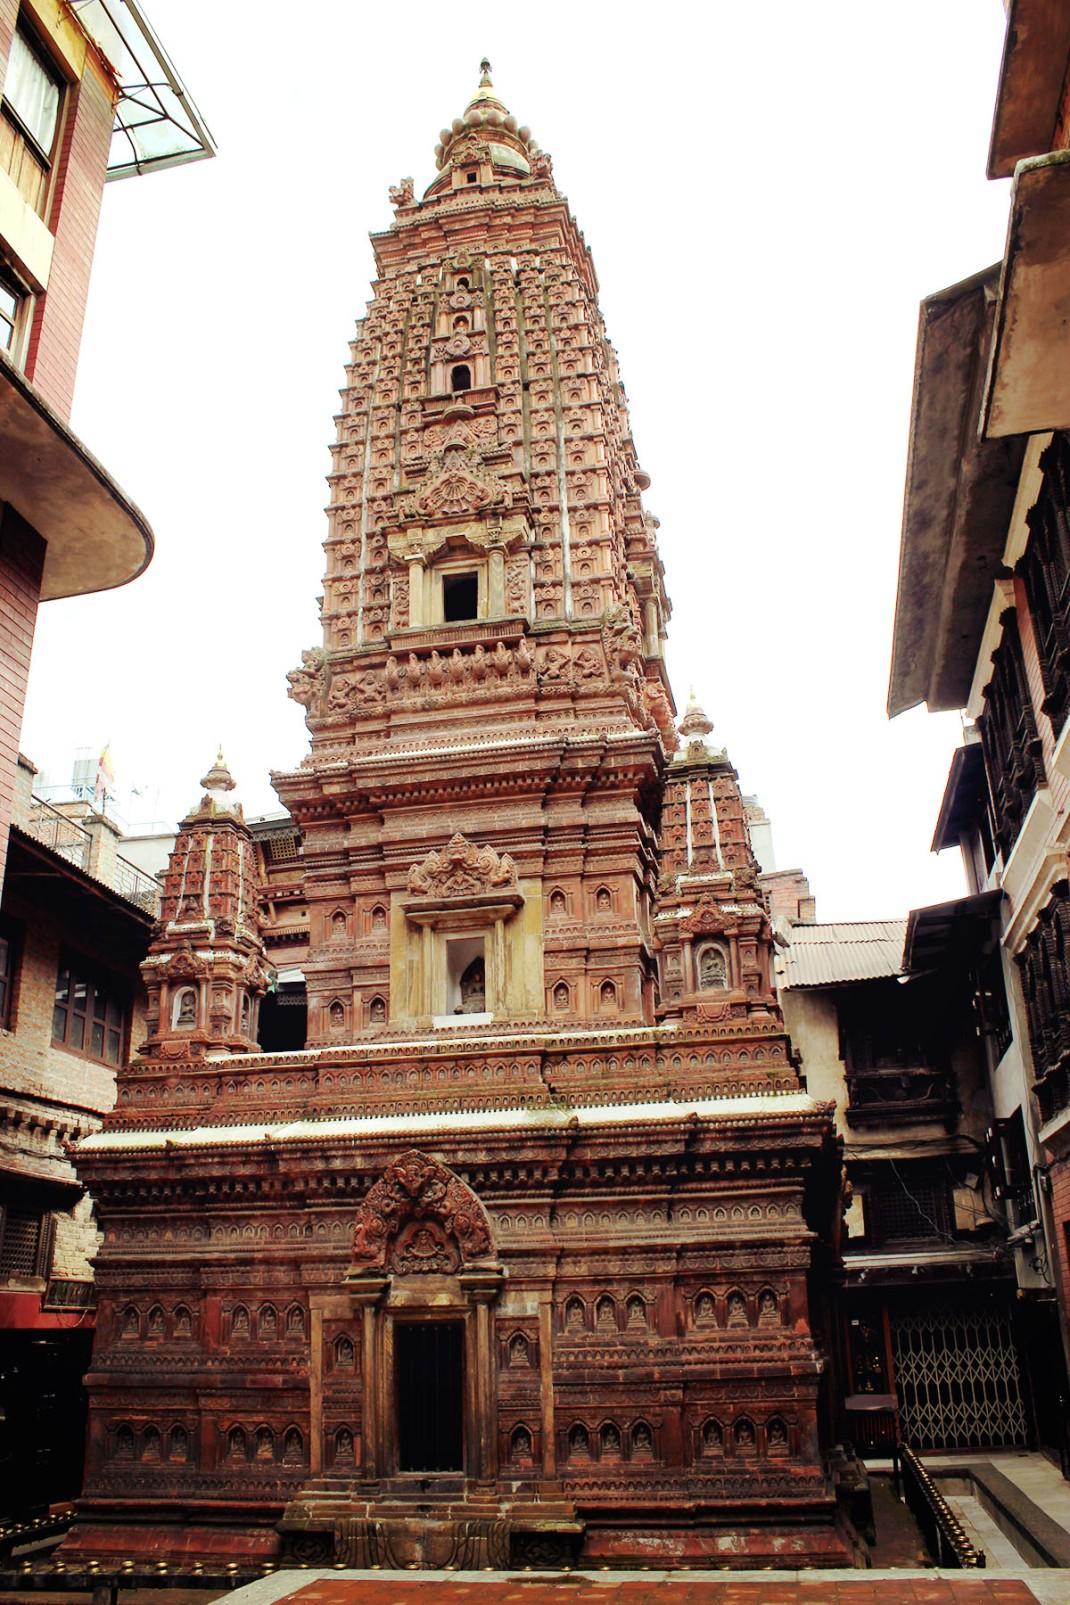 Mahabuddha Temple